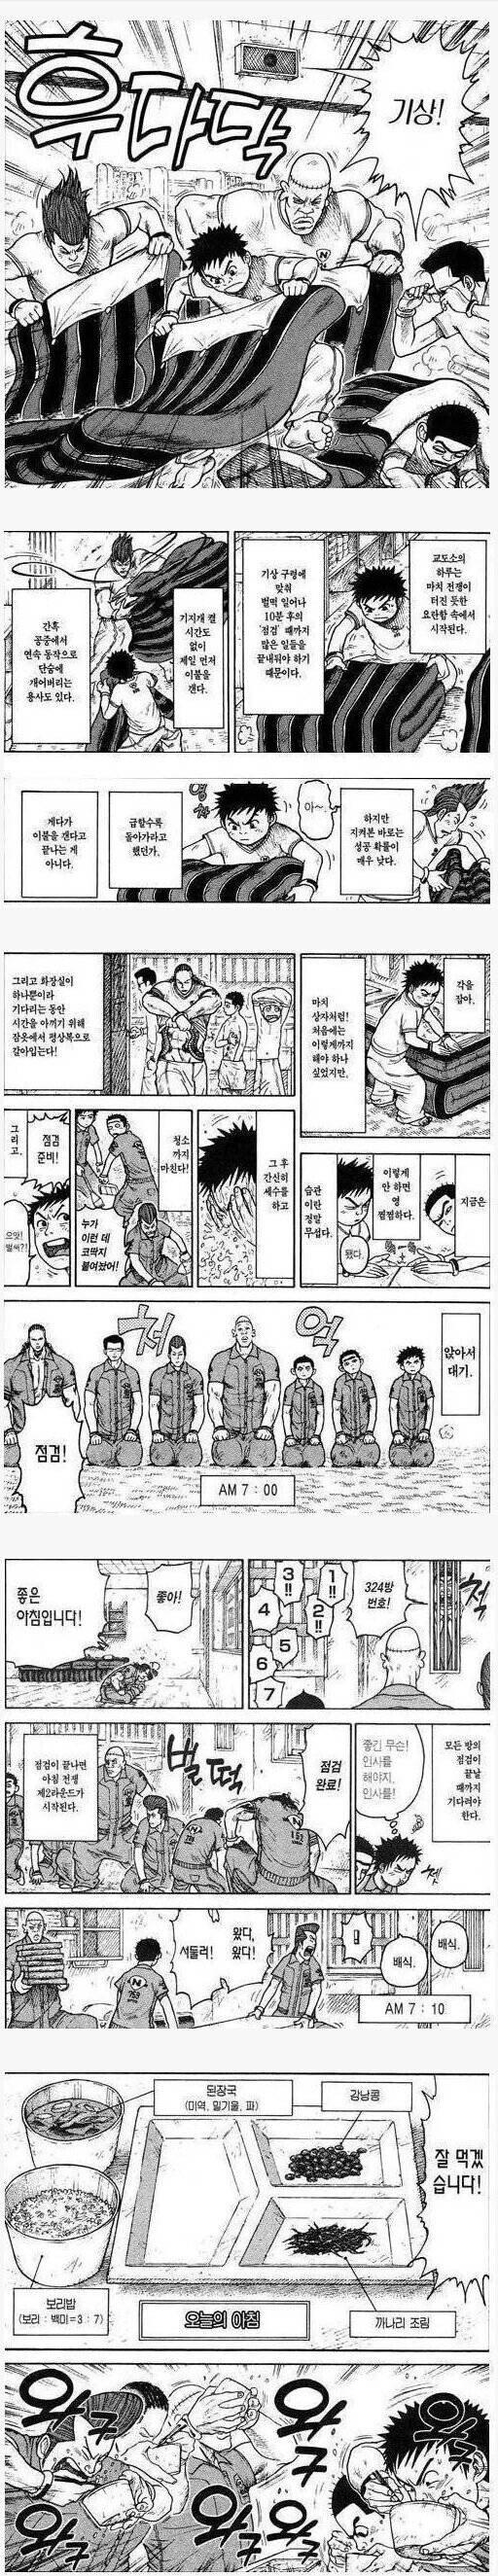 aa.jpg 일본 교도소 만화